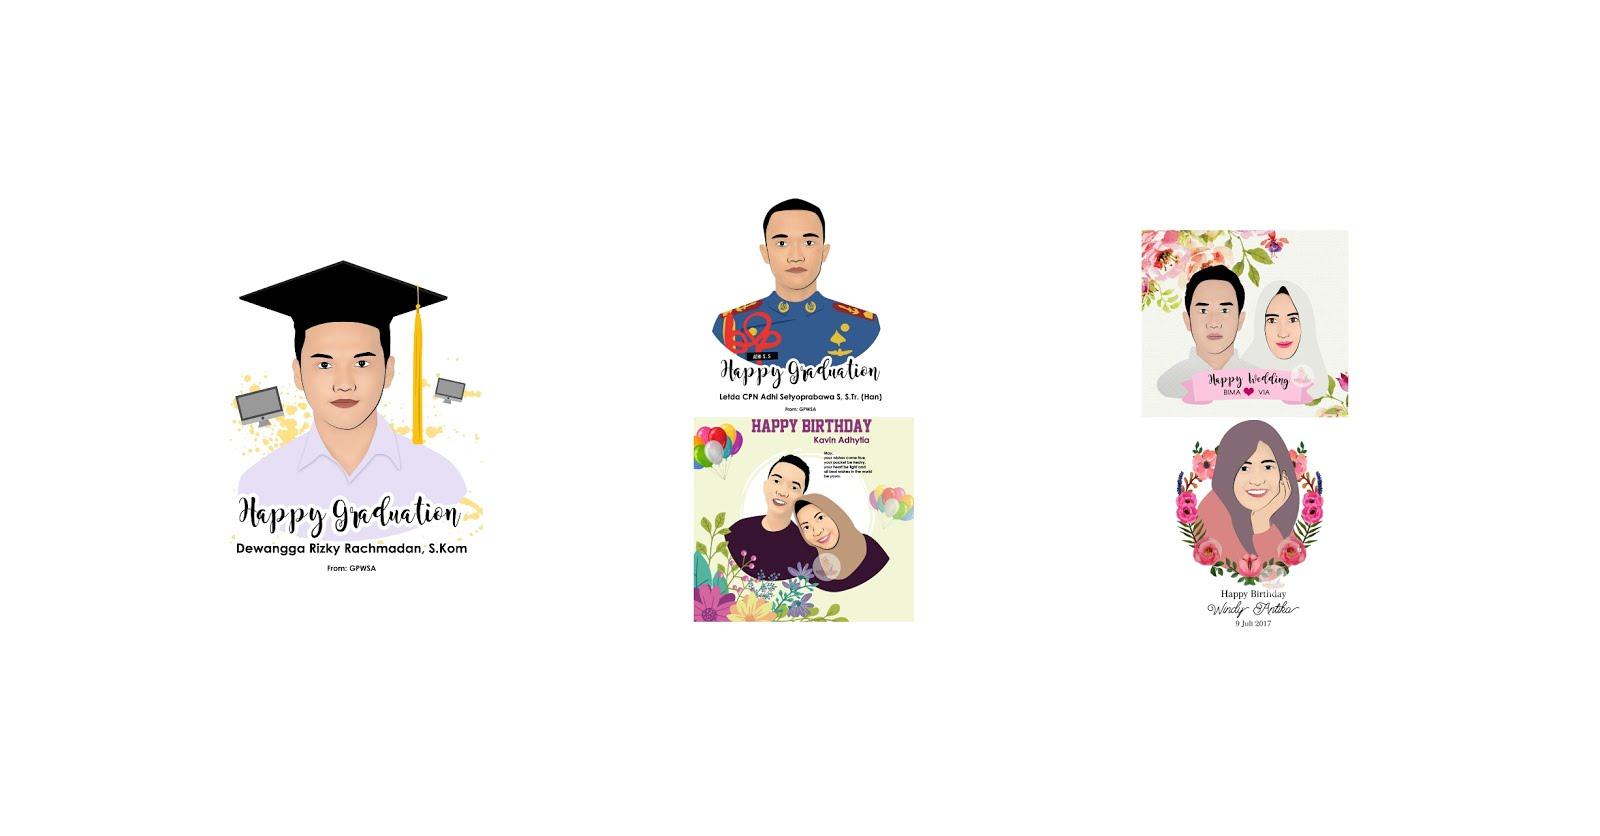 Kartun wajah & Merchandise